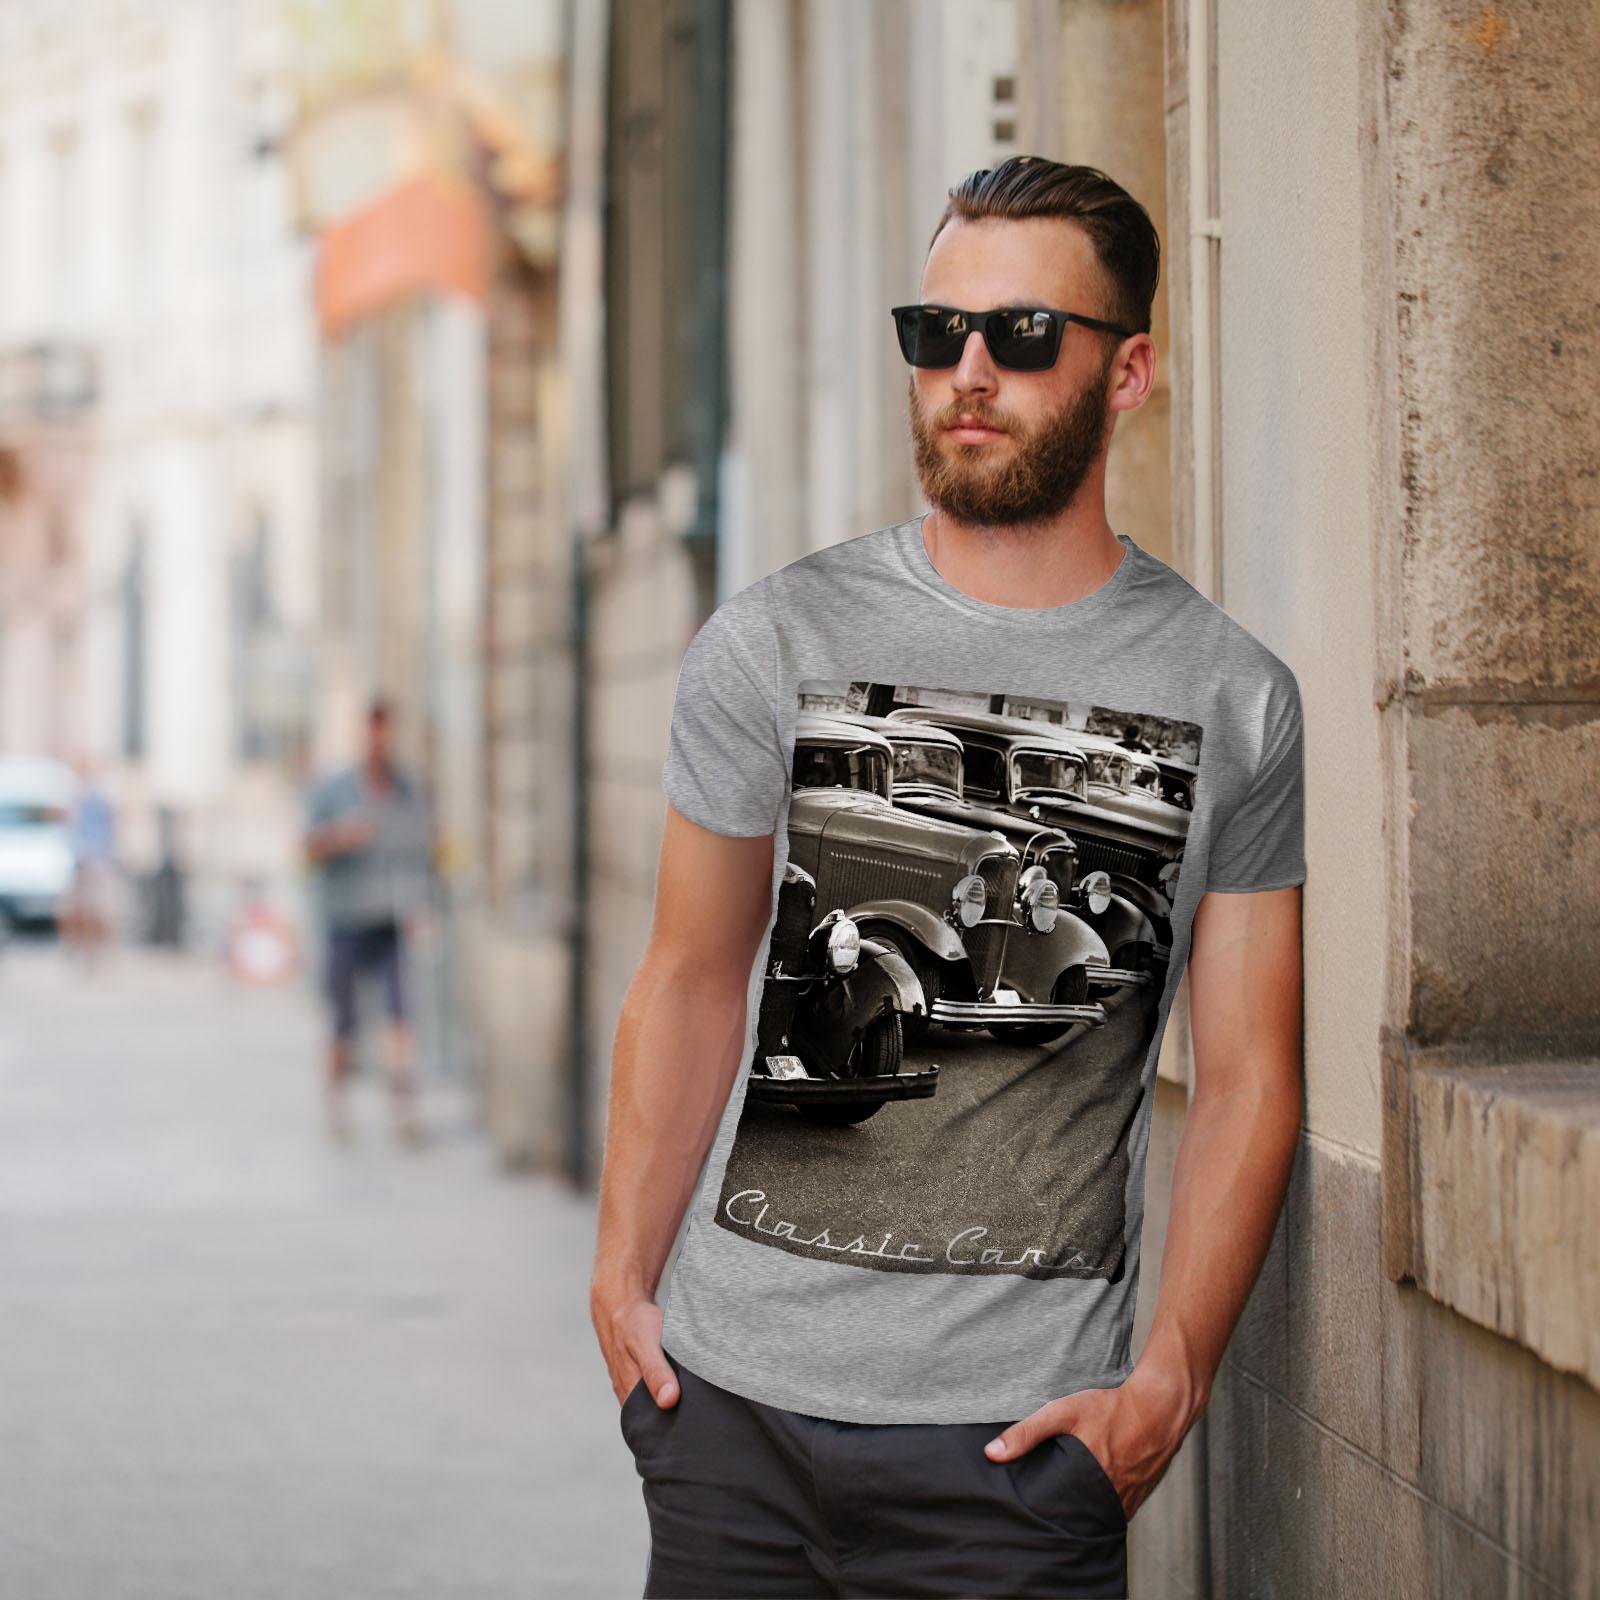 Wellcoda-Classic-Cars-Mens-T-shirt-Retro-Graphic-Design-Printed-Tee thumbnail 17